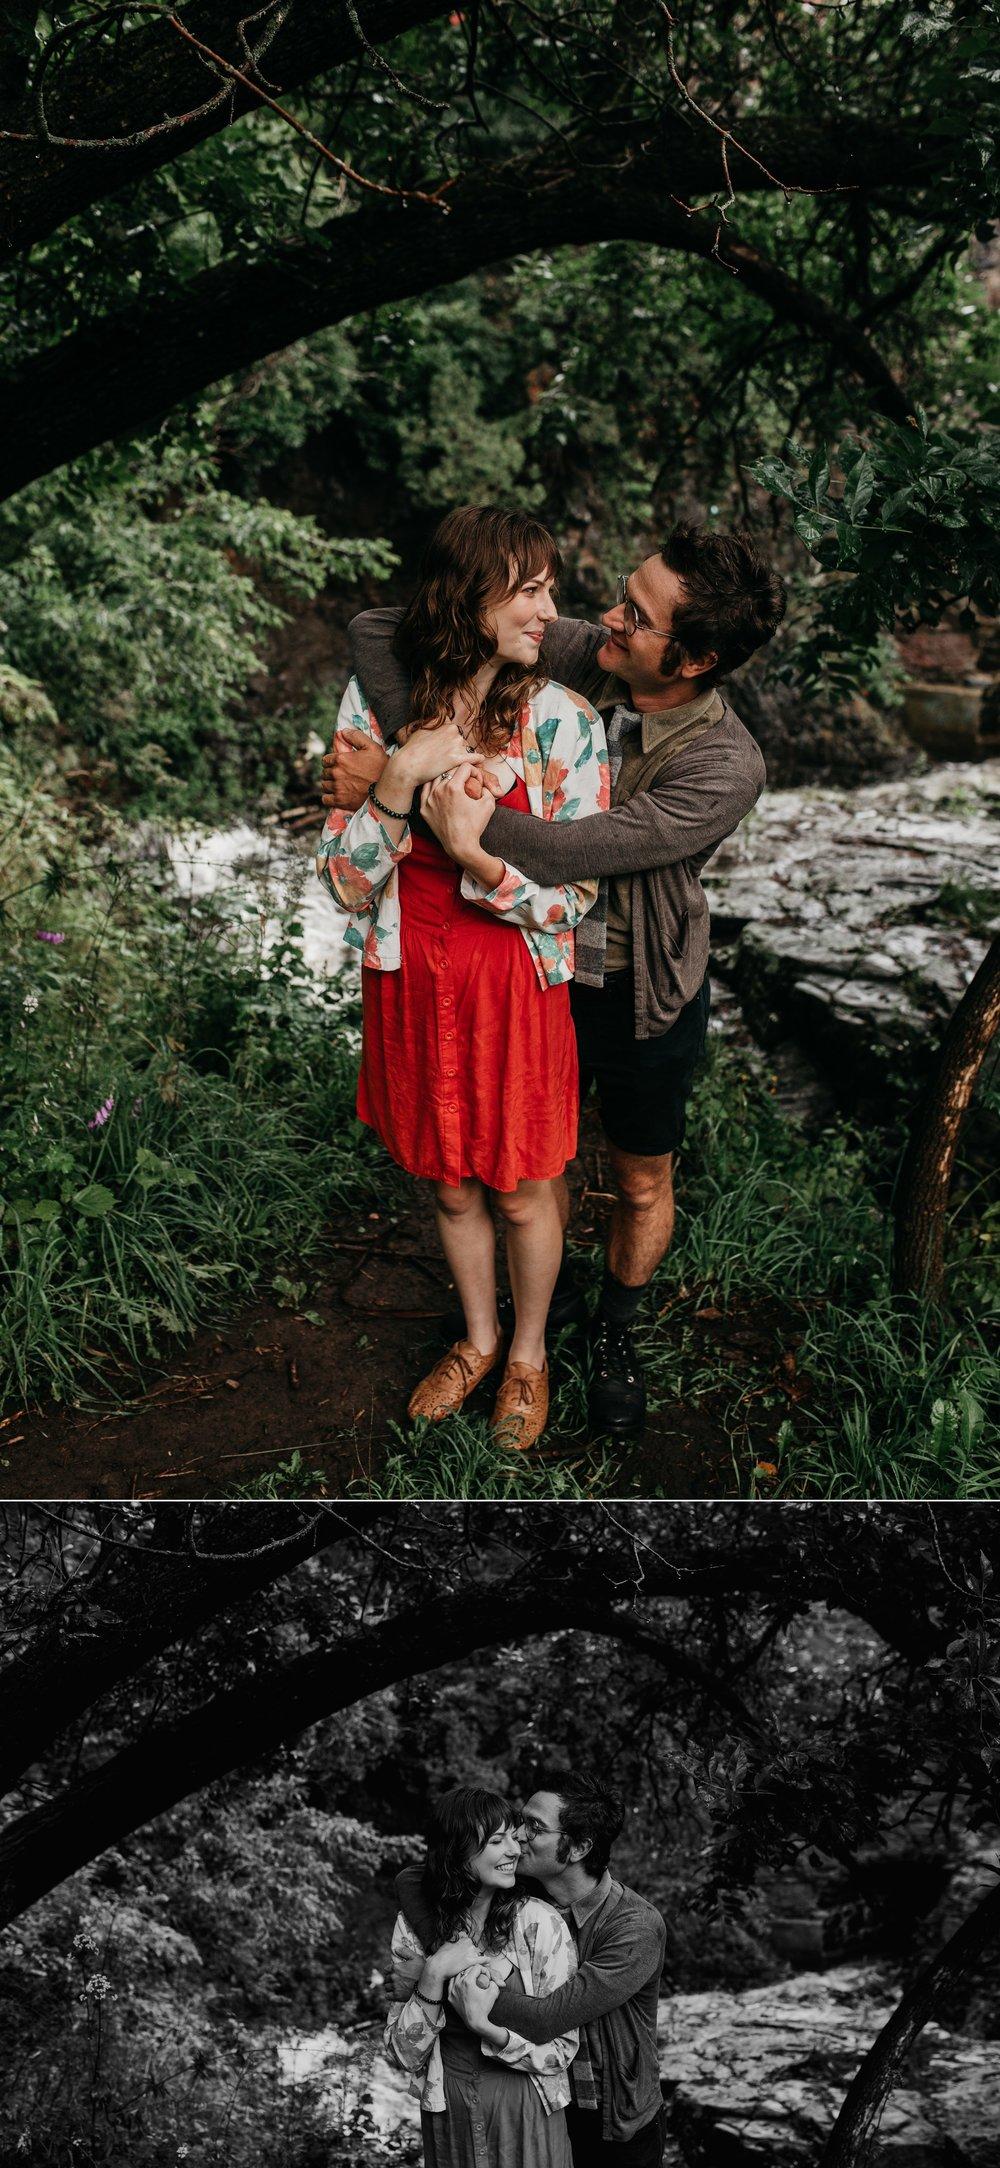 mandy aaron engagement minneapolis minnesota texas austin wedding elopement destination intimate best photographer_0104.jpg